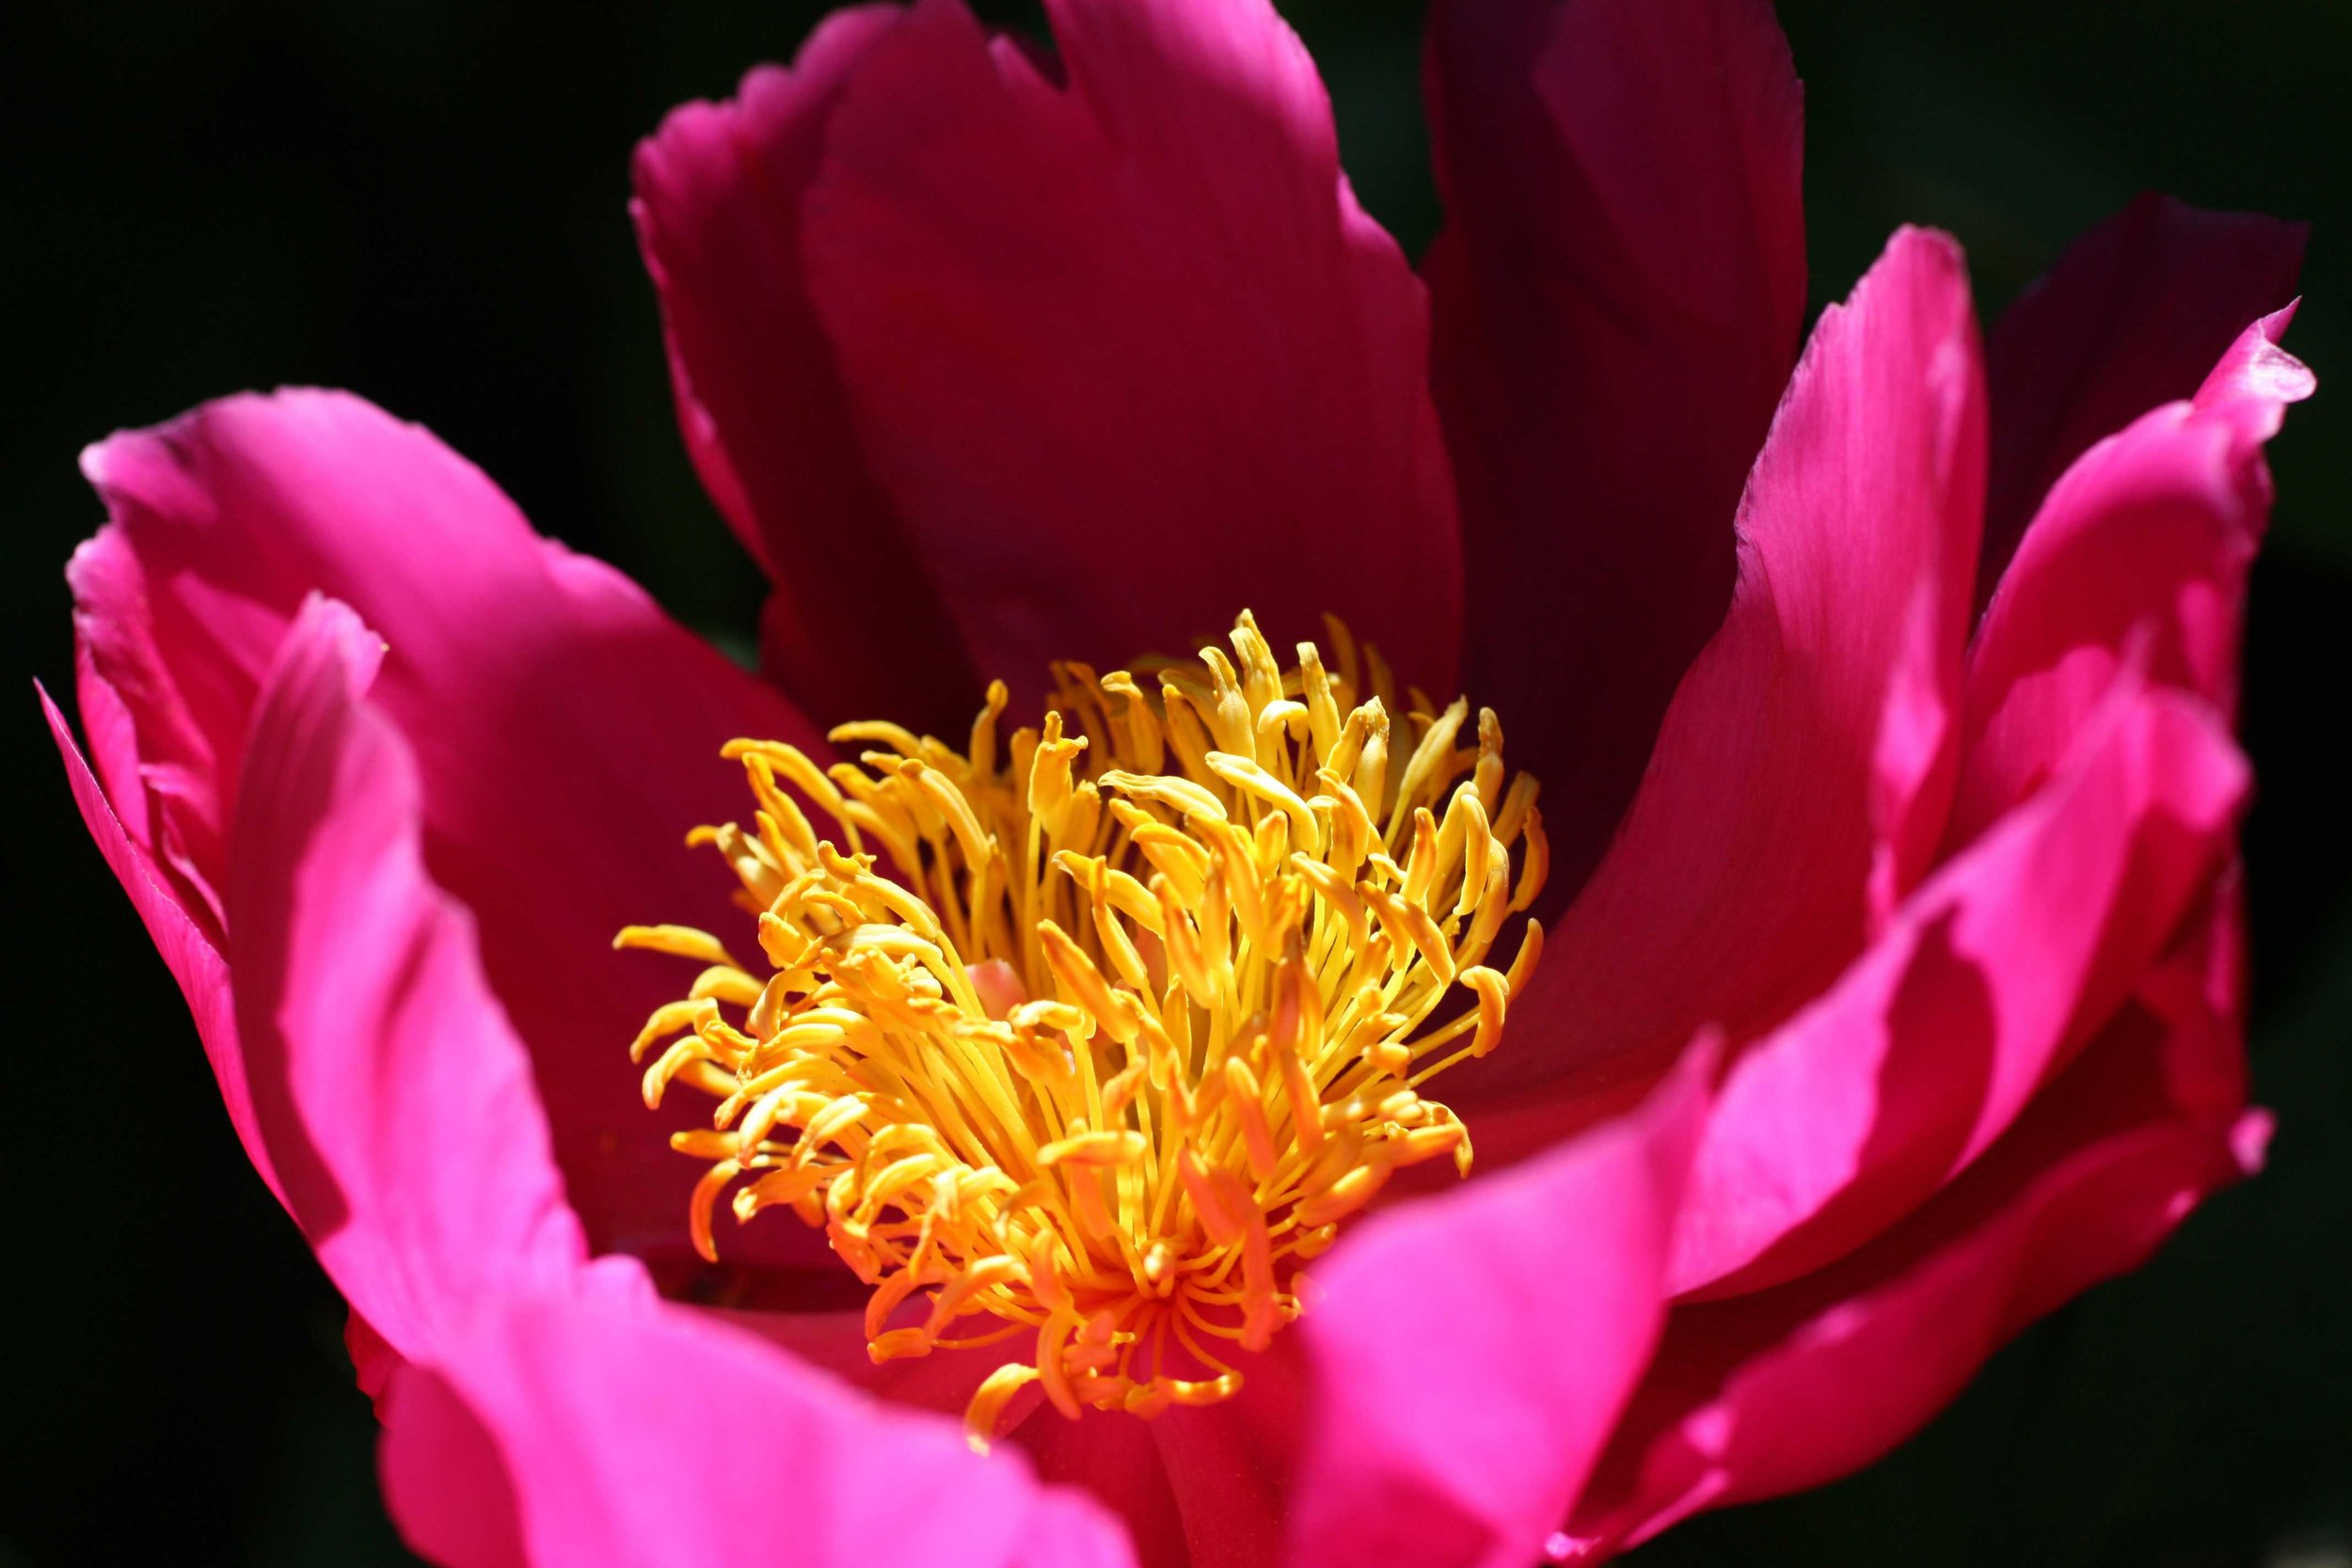 80_Pink-Peony-with-yellow-center_rgb_opt_web.jpg